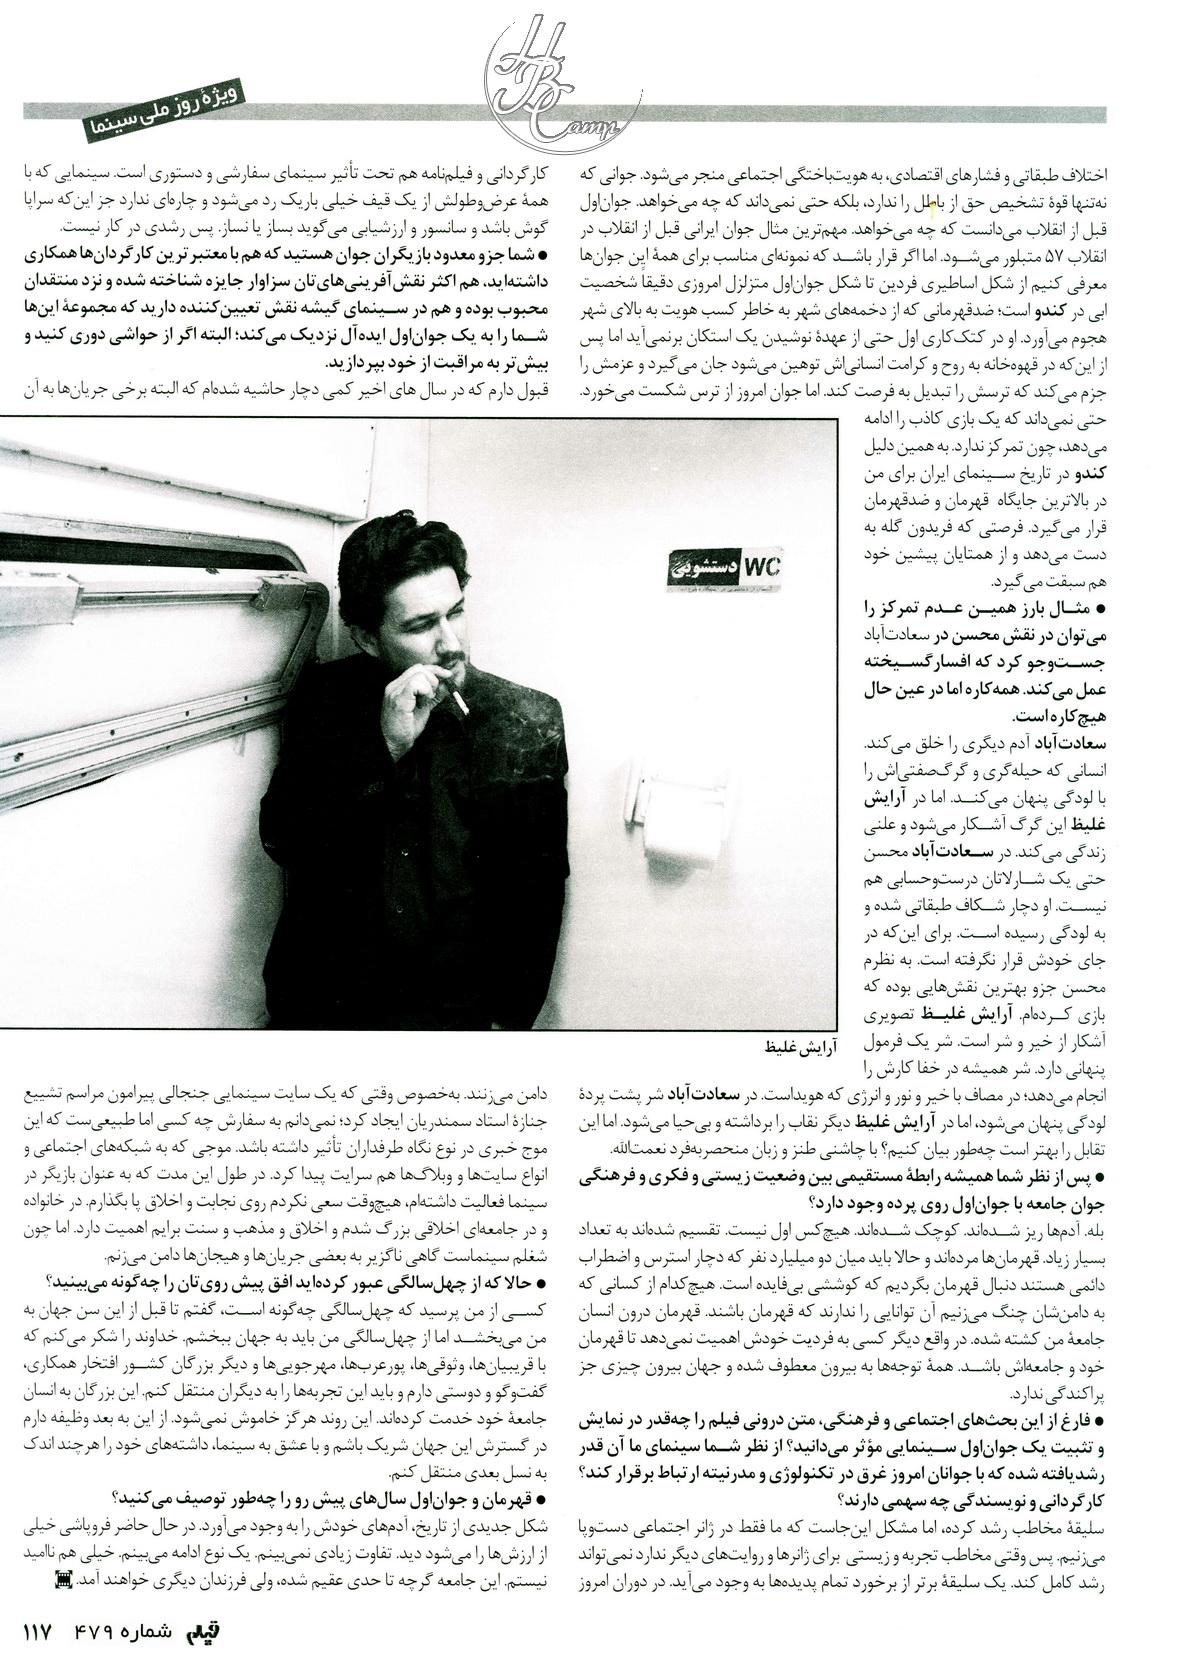 http://yotab.persiangig.com/magazin/film479/005.jpg